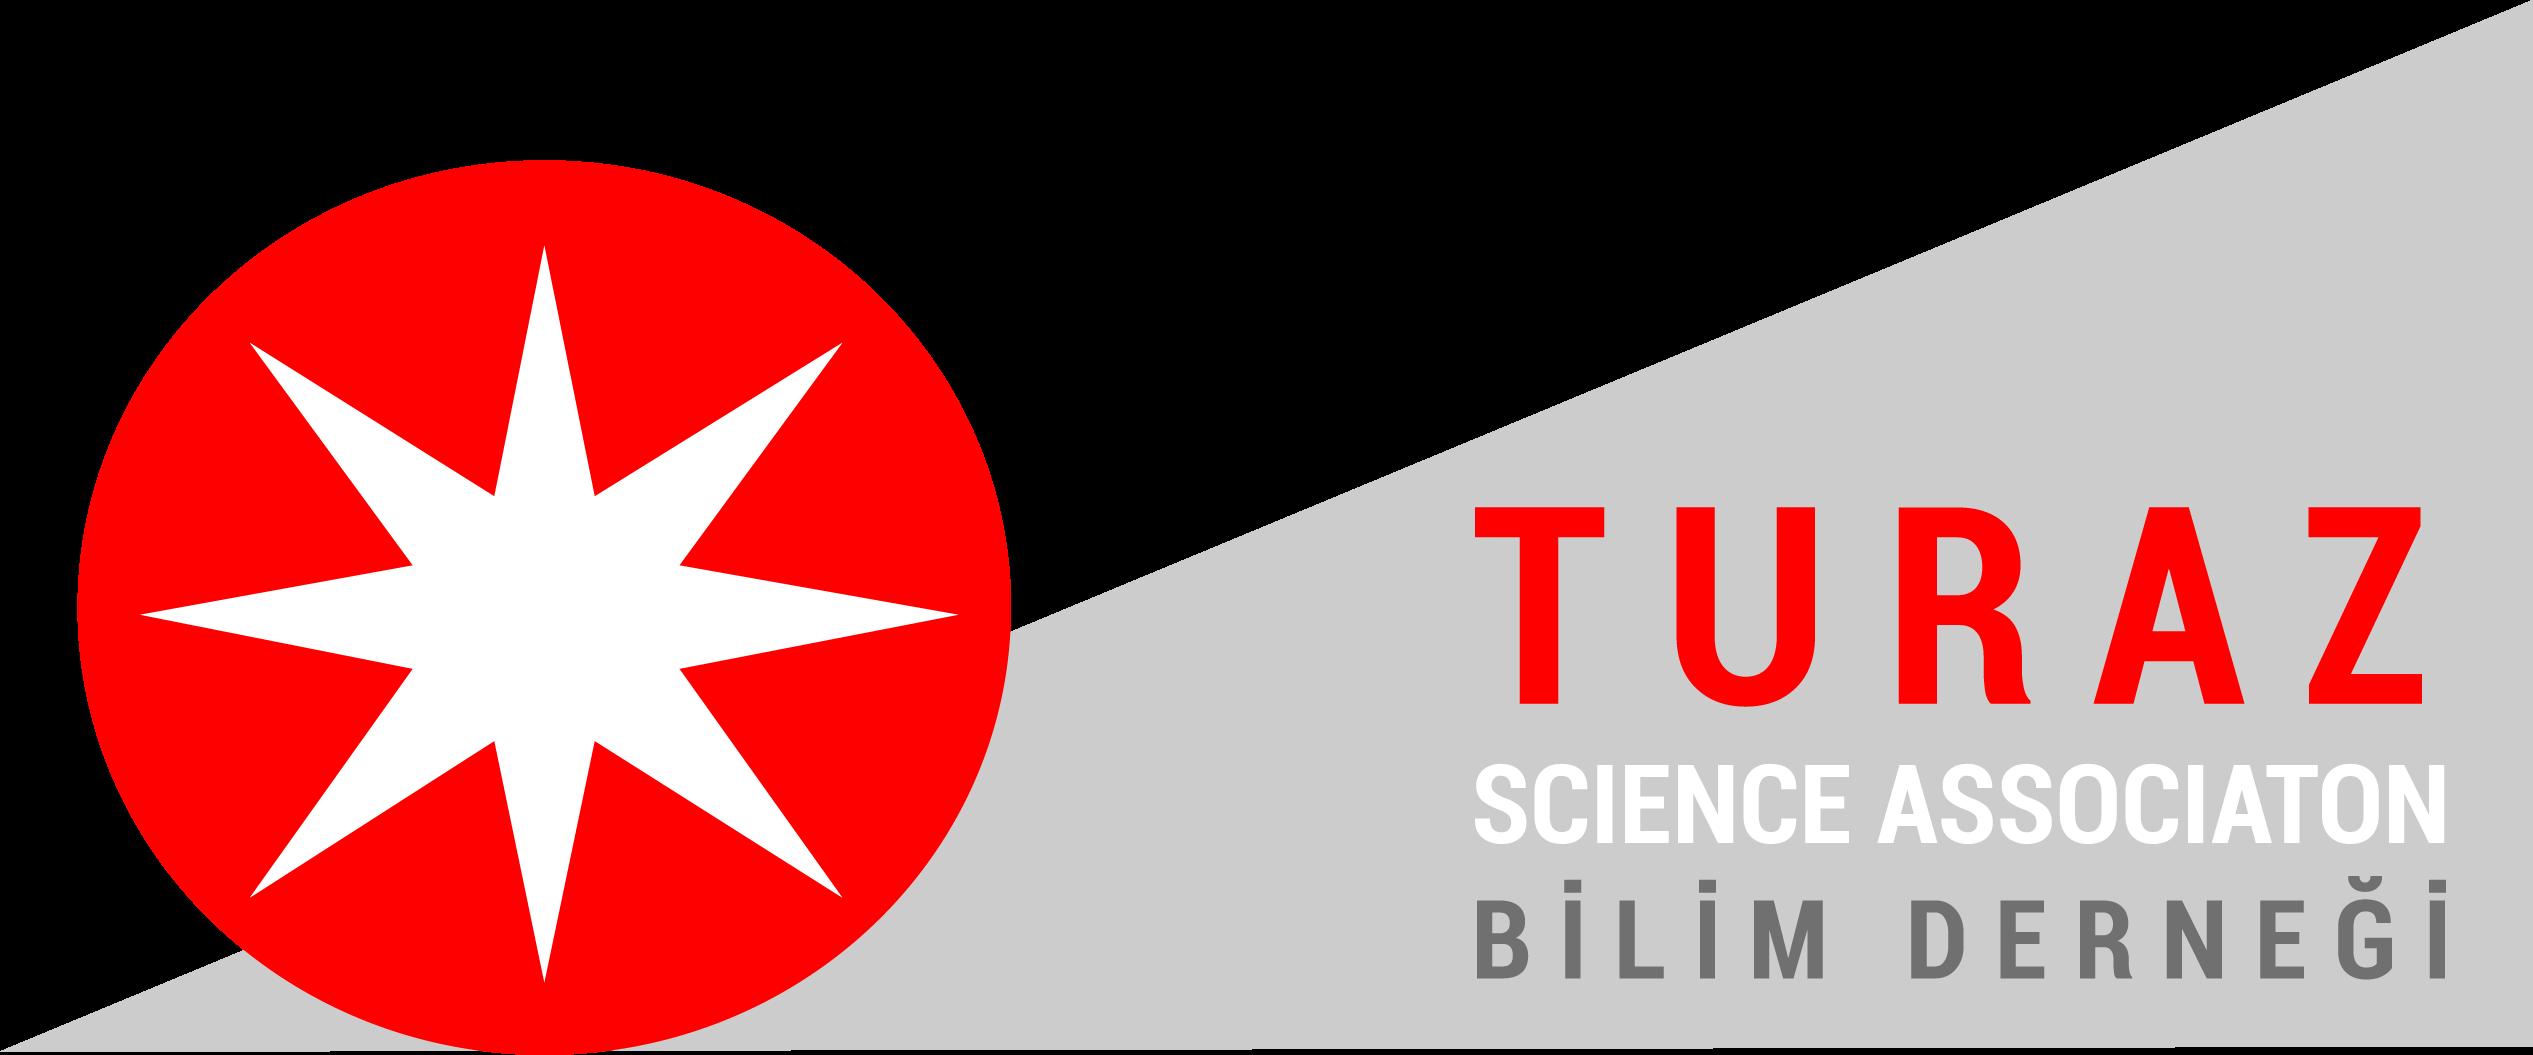 Turaz Science Association